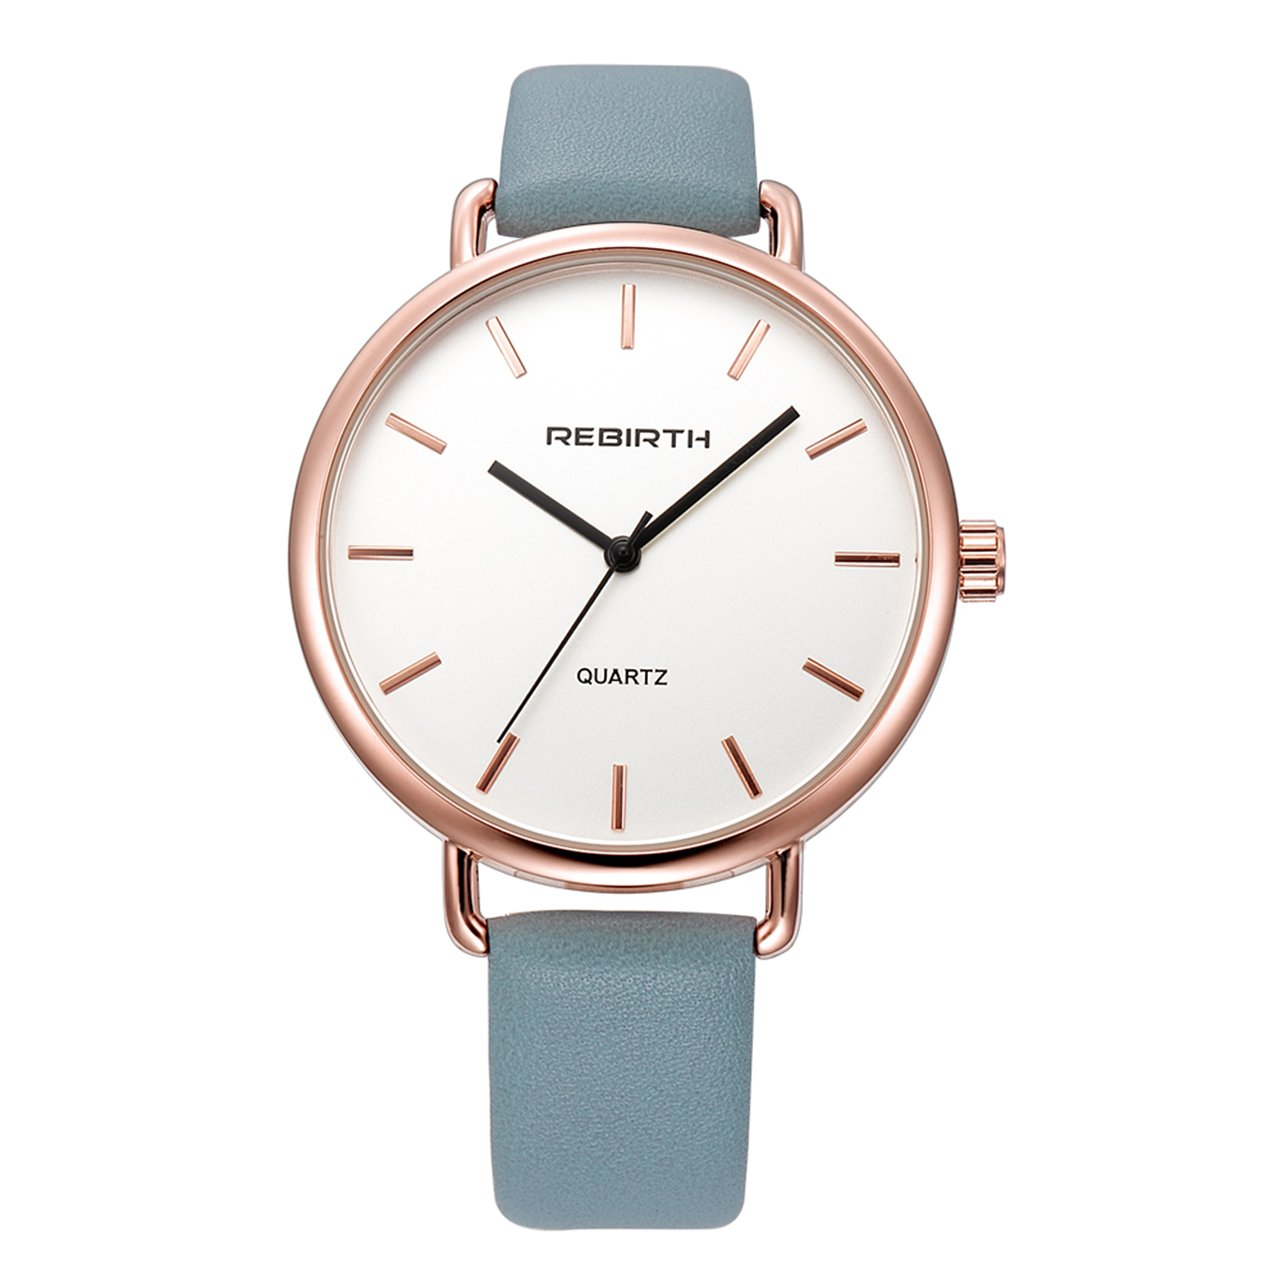 Top Plaza Unisex Classic Luxury Dress Blue Leather Rose Gold Case Quartz Wrist Business Analog Watch 3 ATM Waterproof